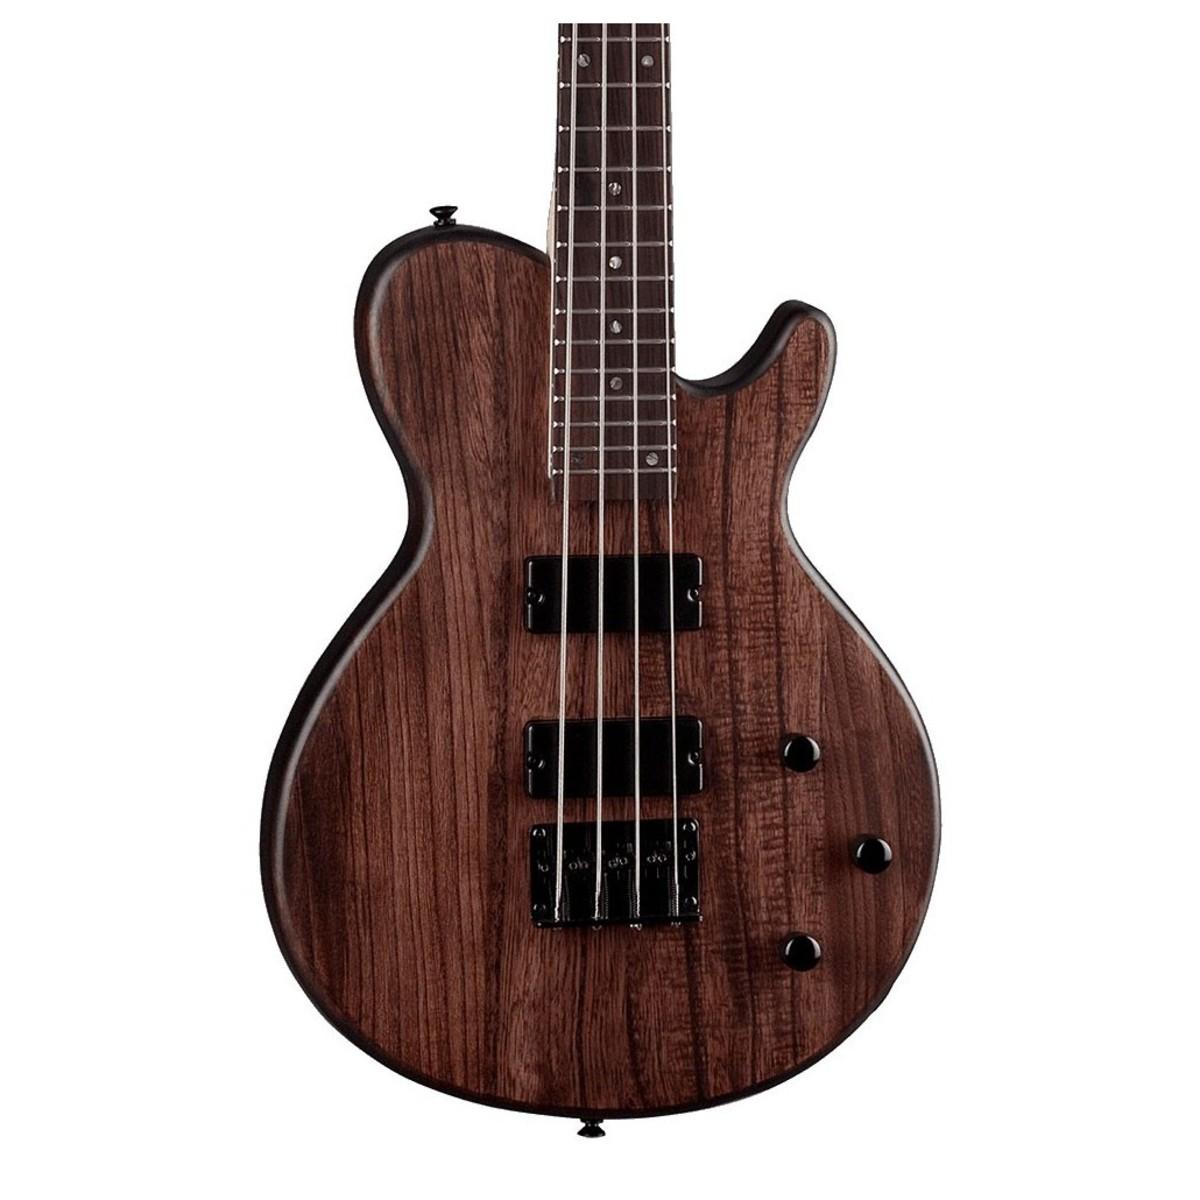 dean evo bass guitar natural satin at gear4music. Black Bedroom Furniture Sets. Home Design Ideas